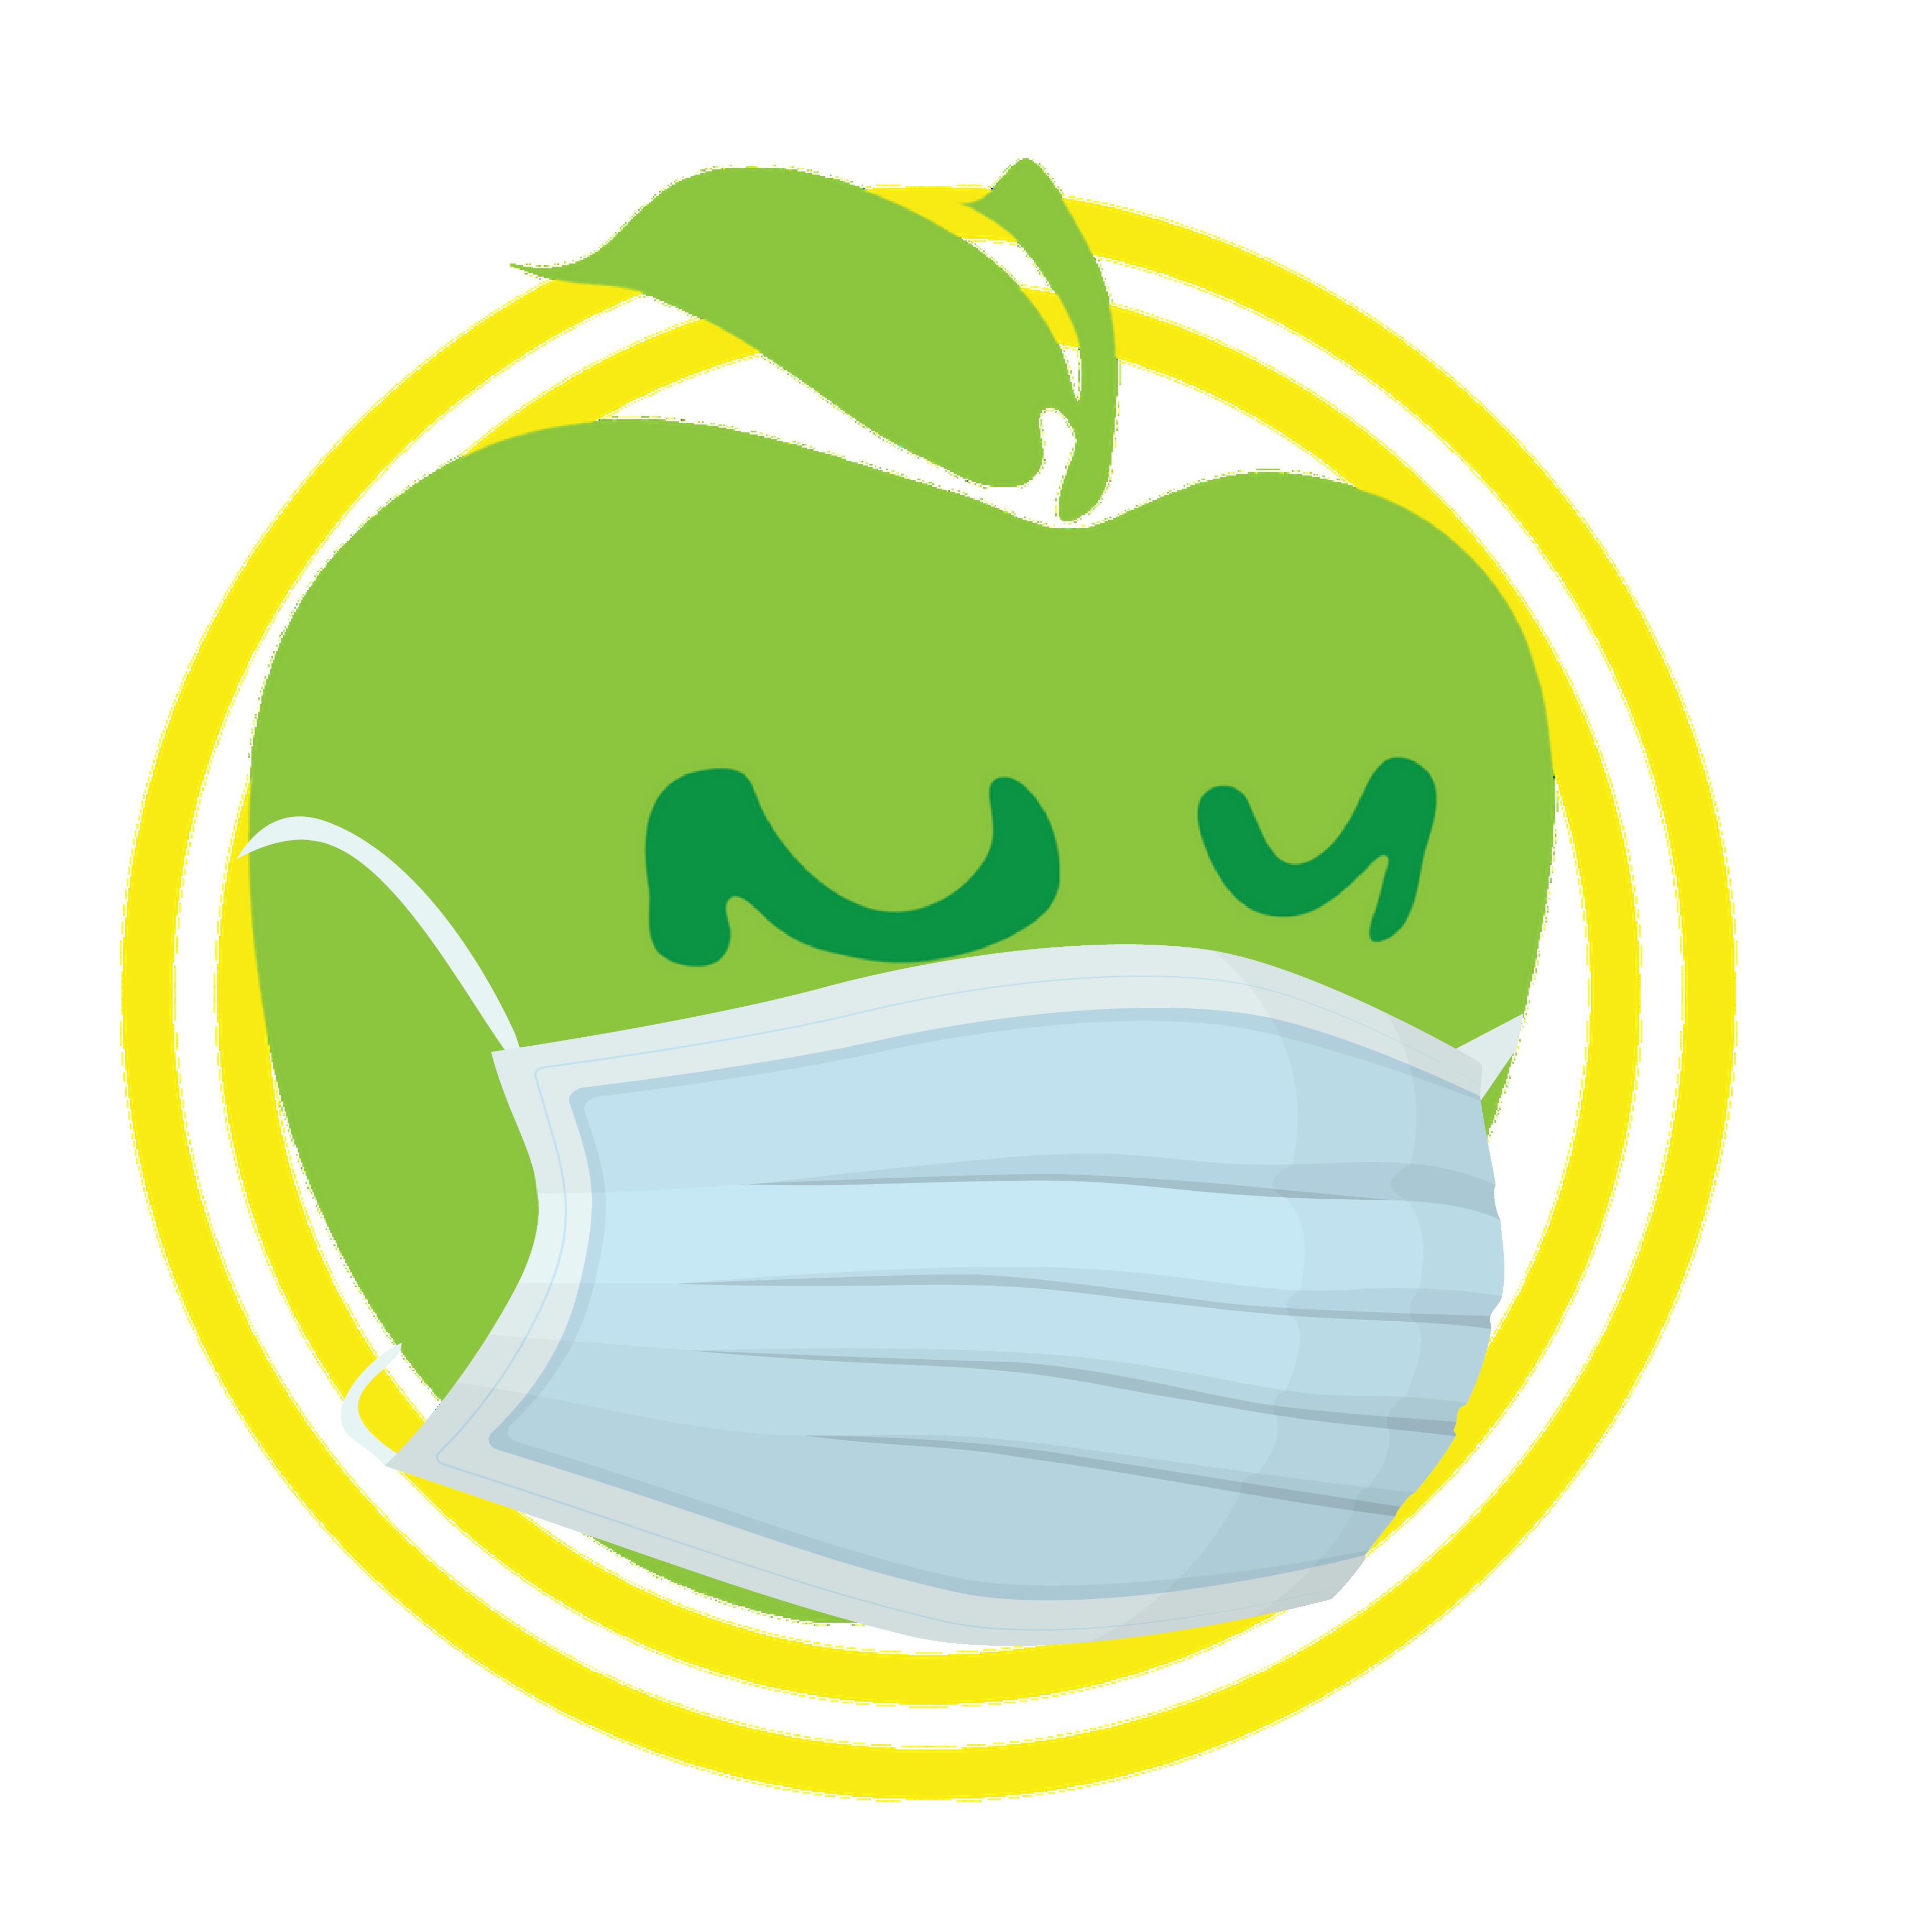 Apple Logo with Blue Mask